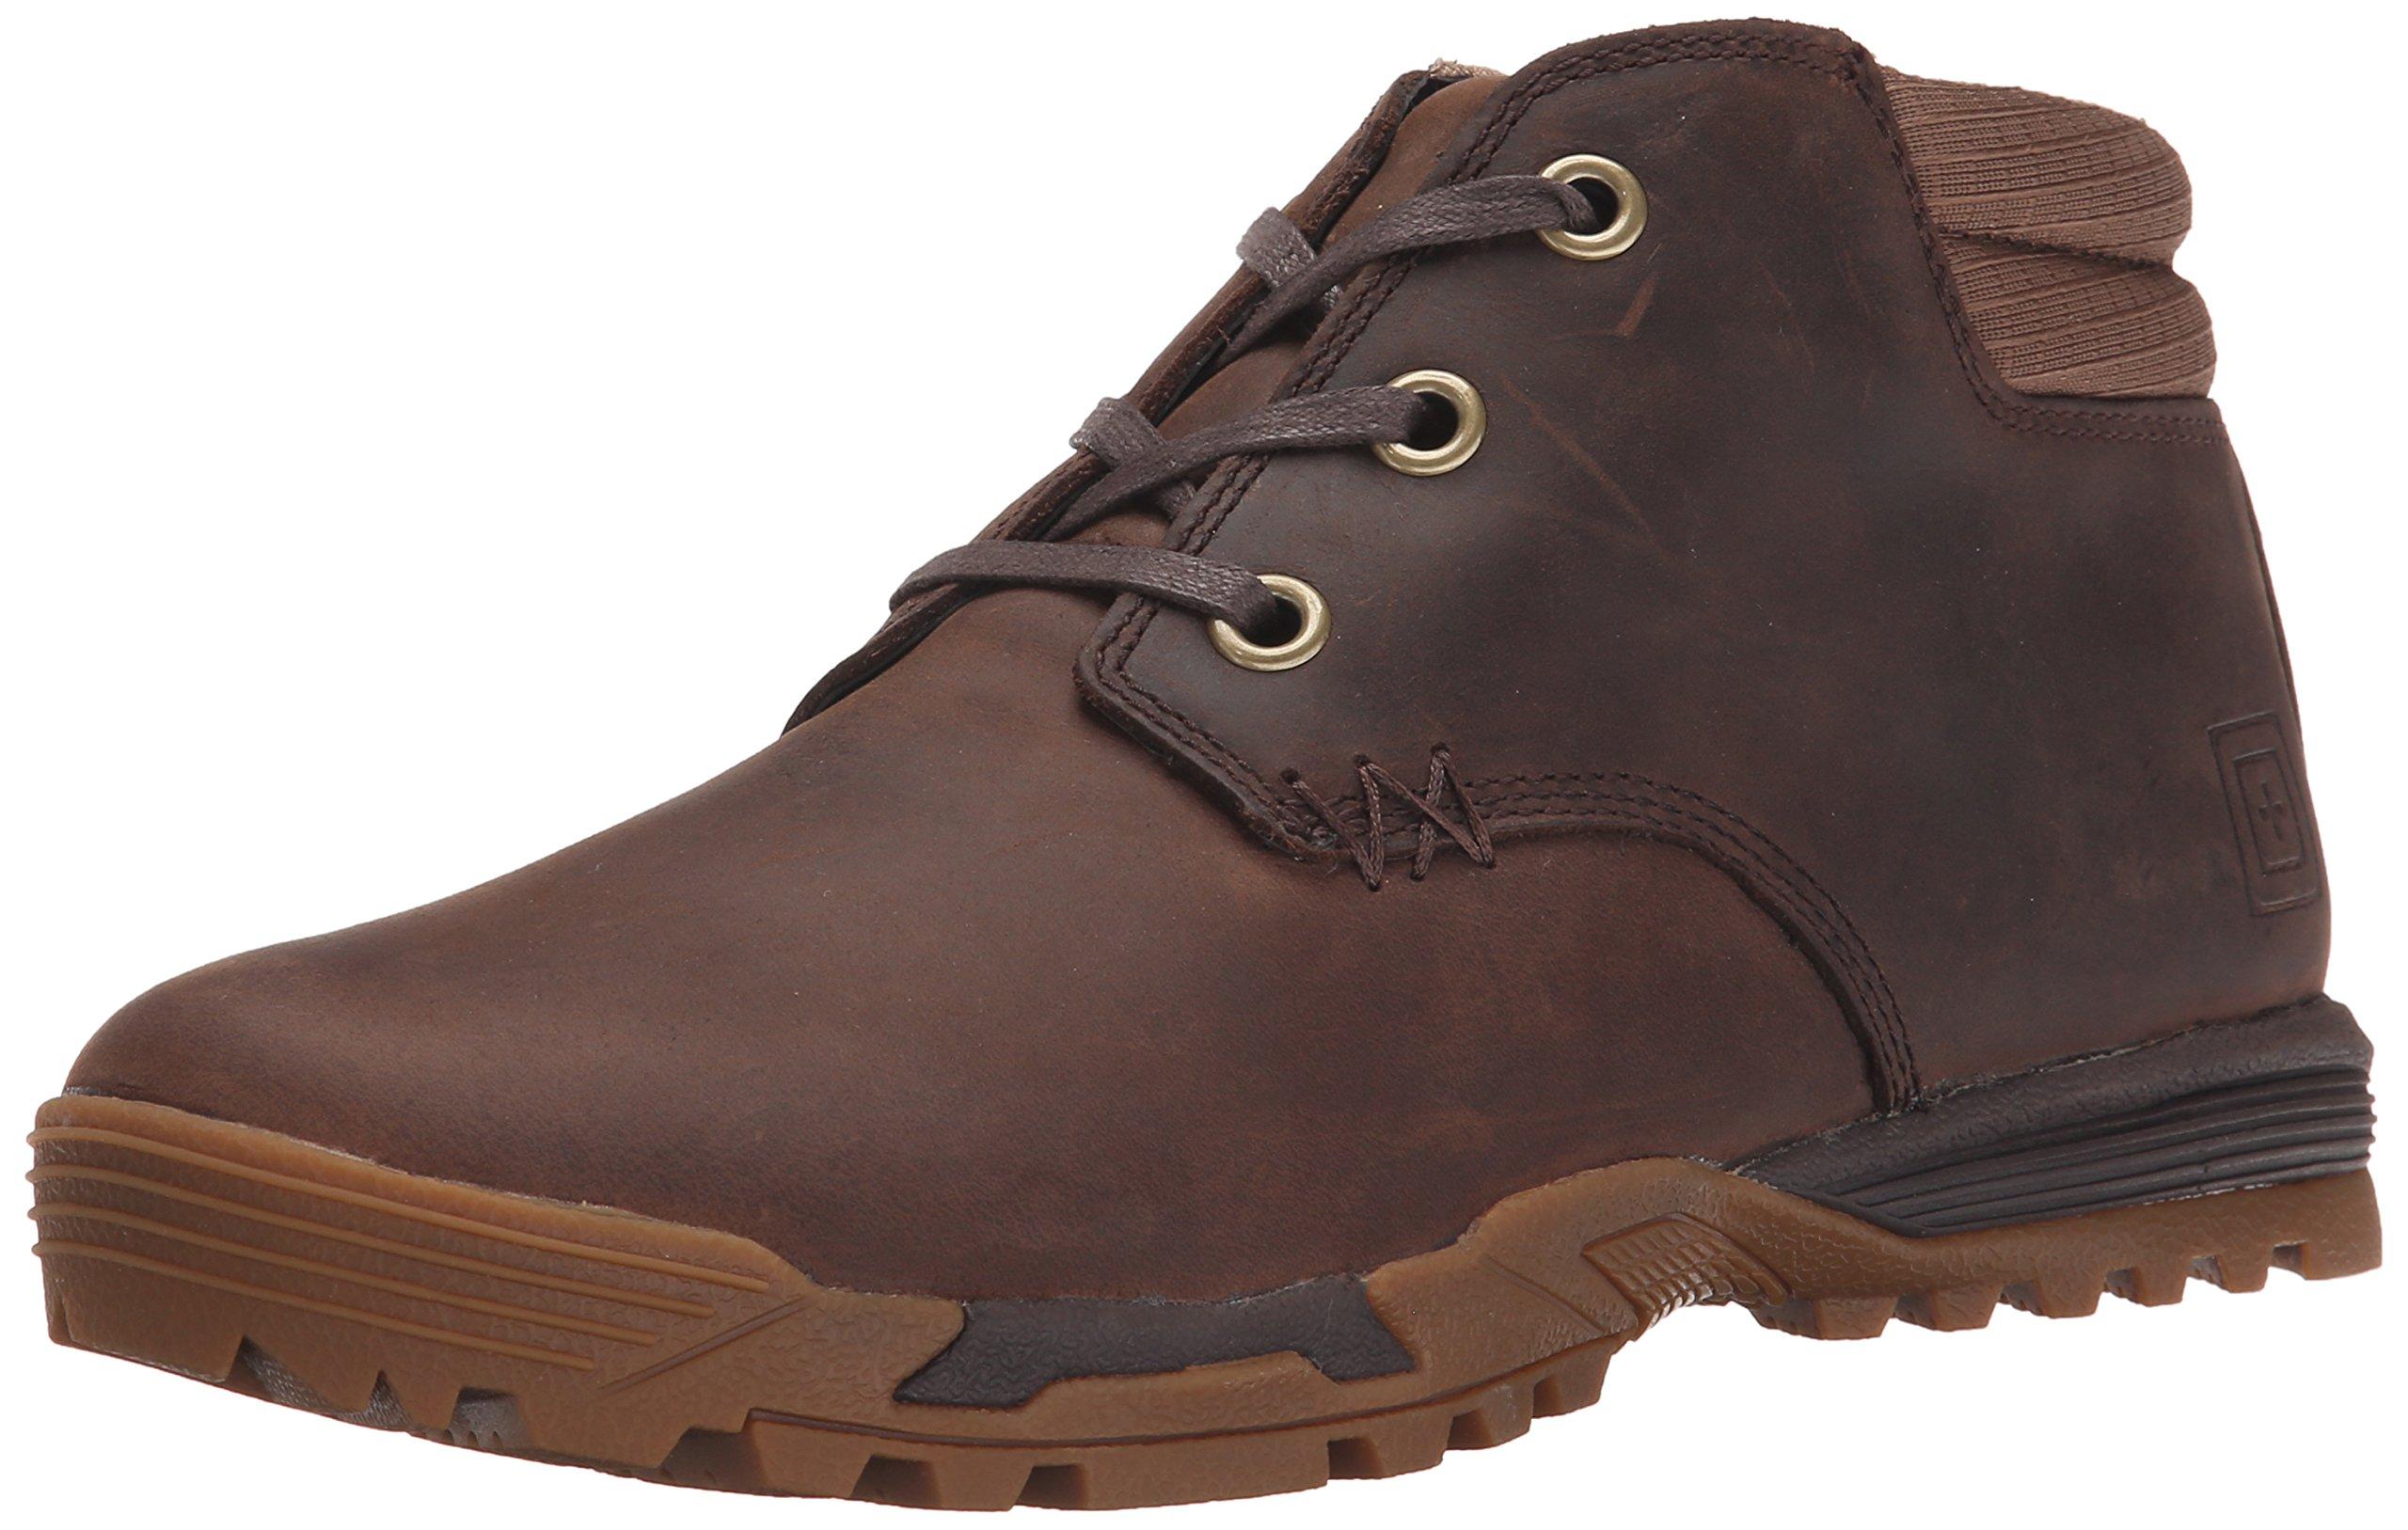 5.11 Tactical Men's Pursuit CDB Work Shoe,Distressed Brown,11 D(M) US by 5.11